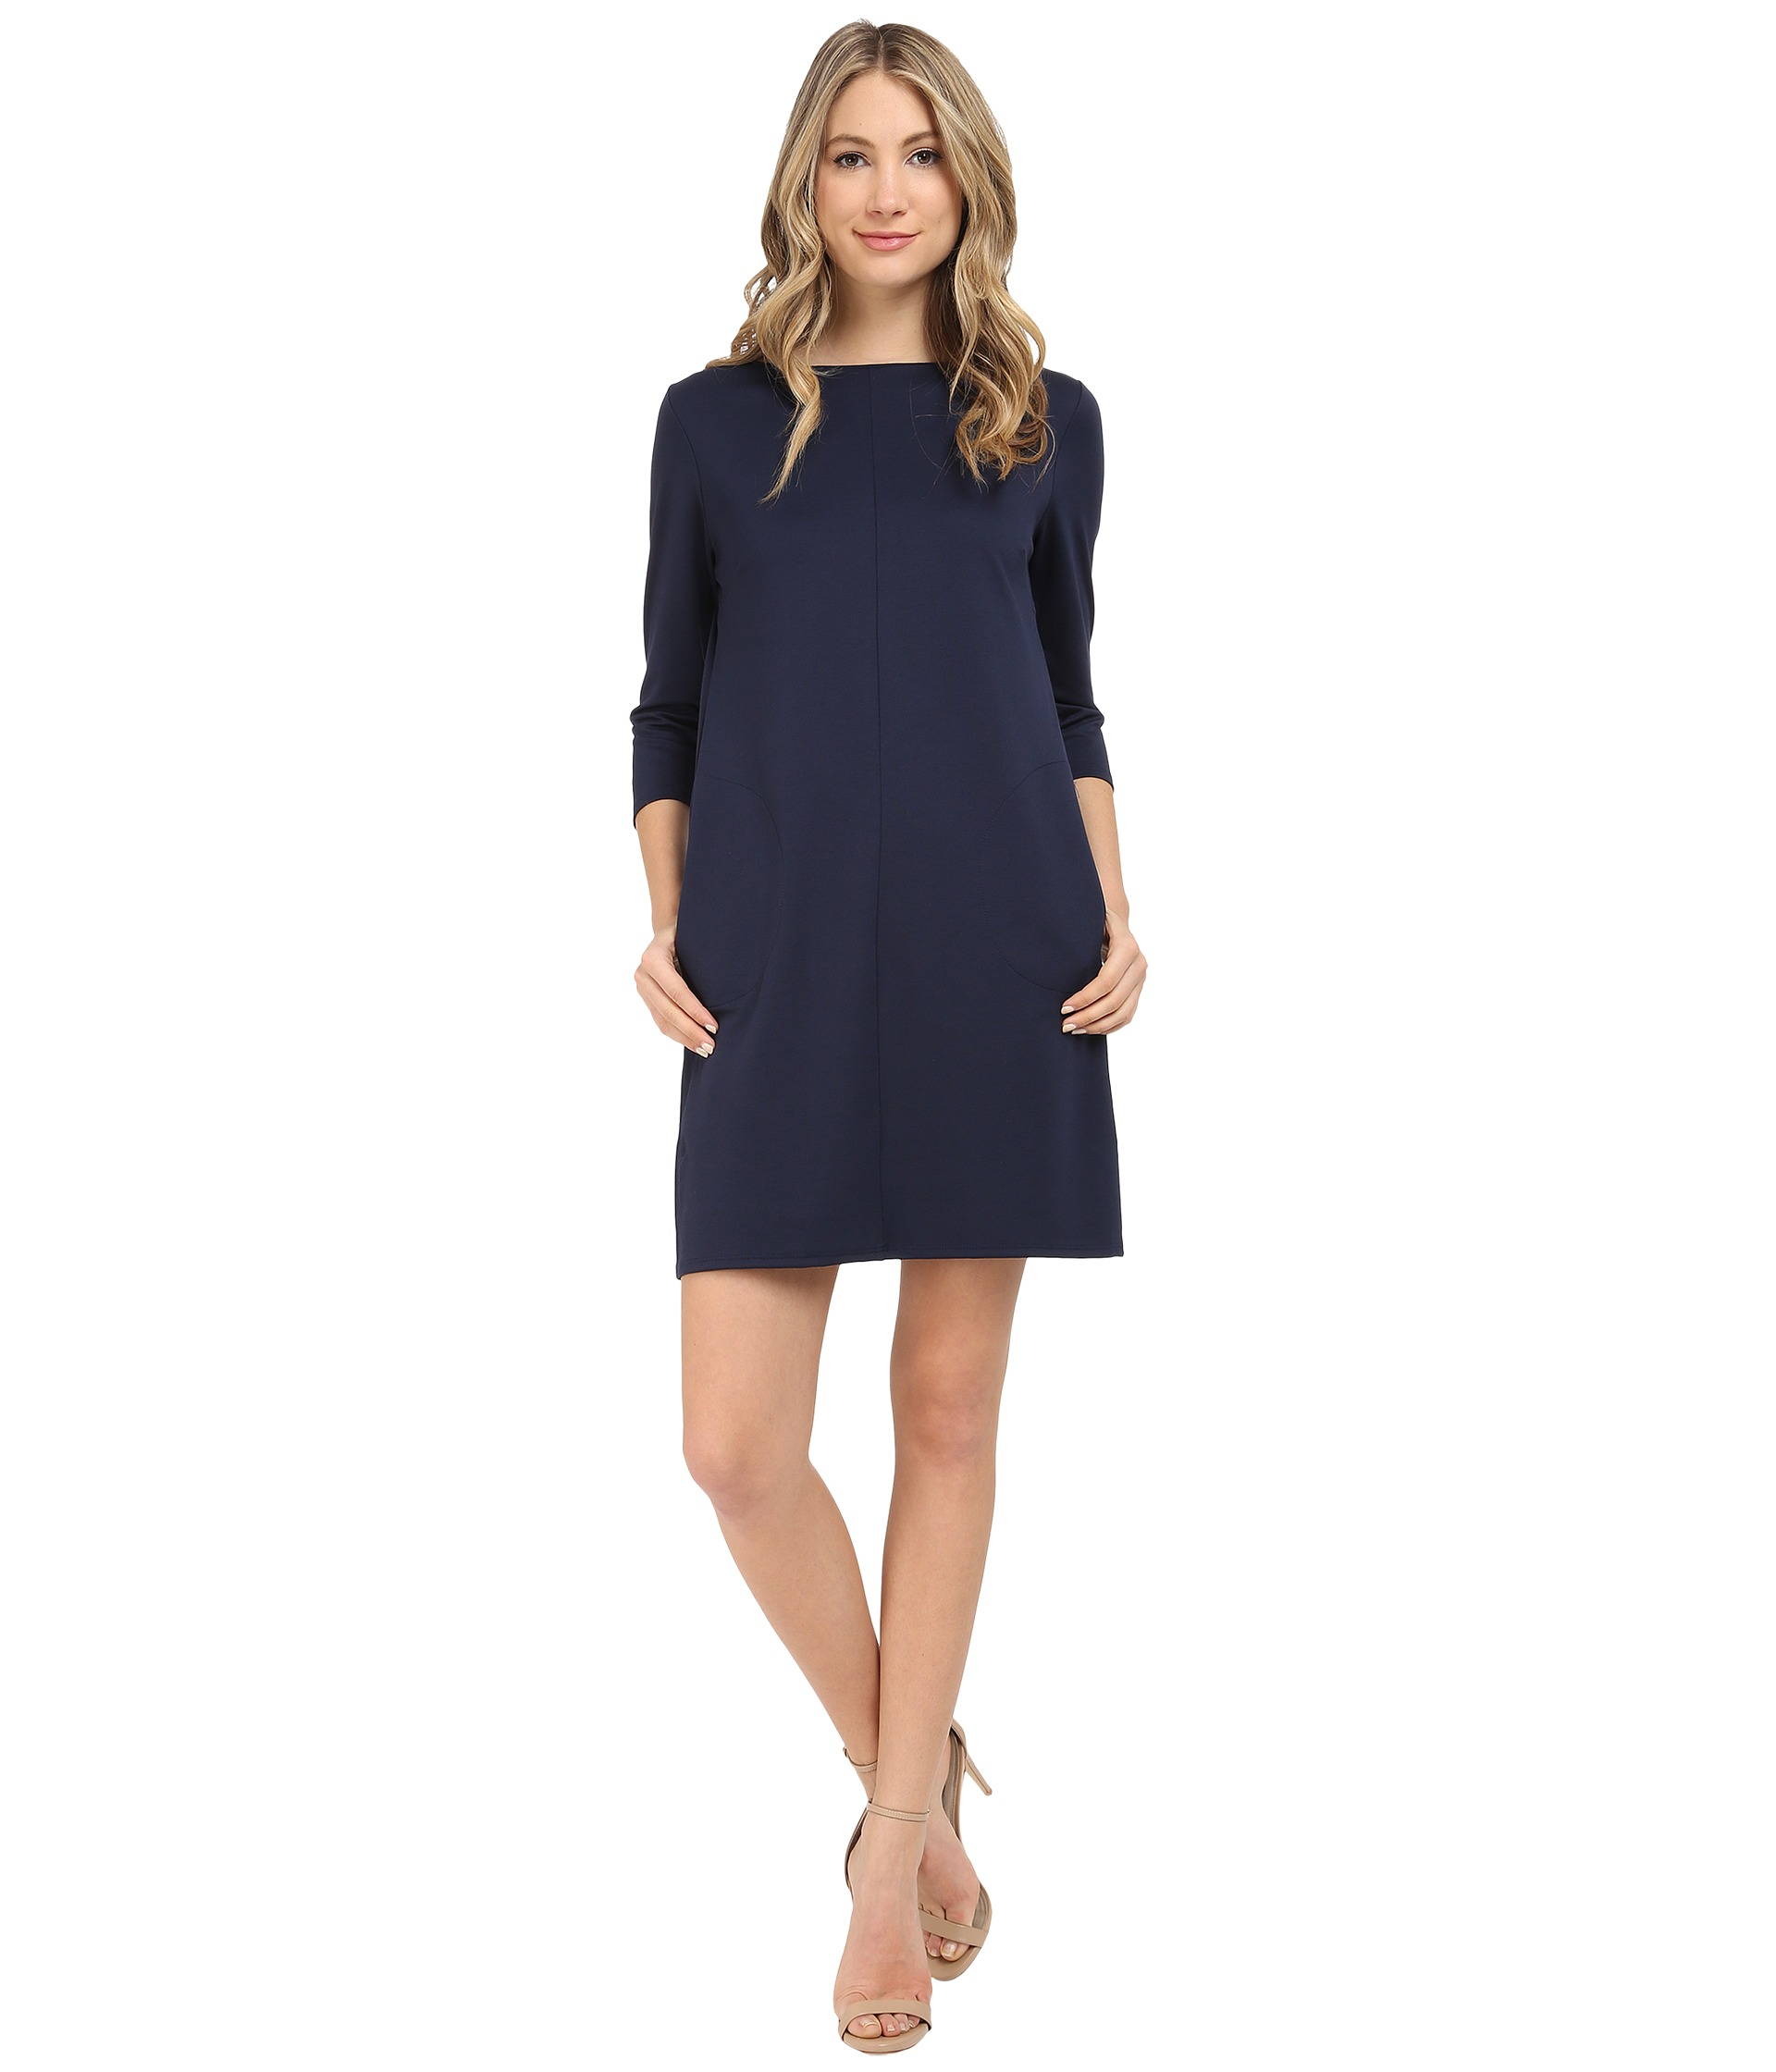 Brigitte bailey Calin 3/4 Sleeve Dress With Pockets in ...